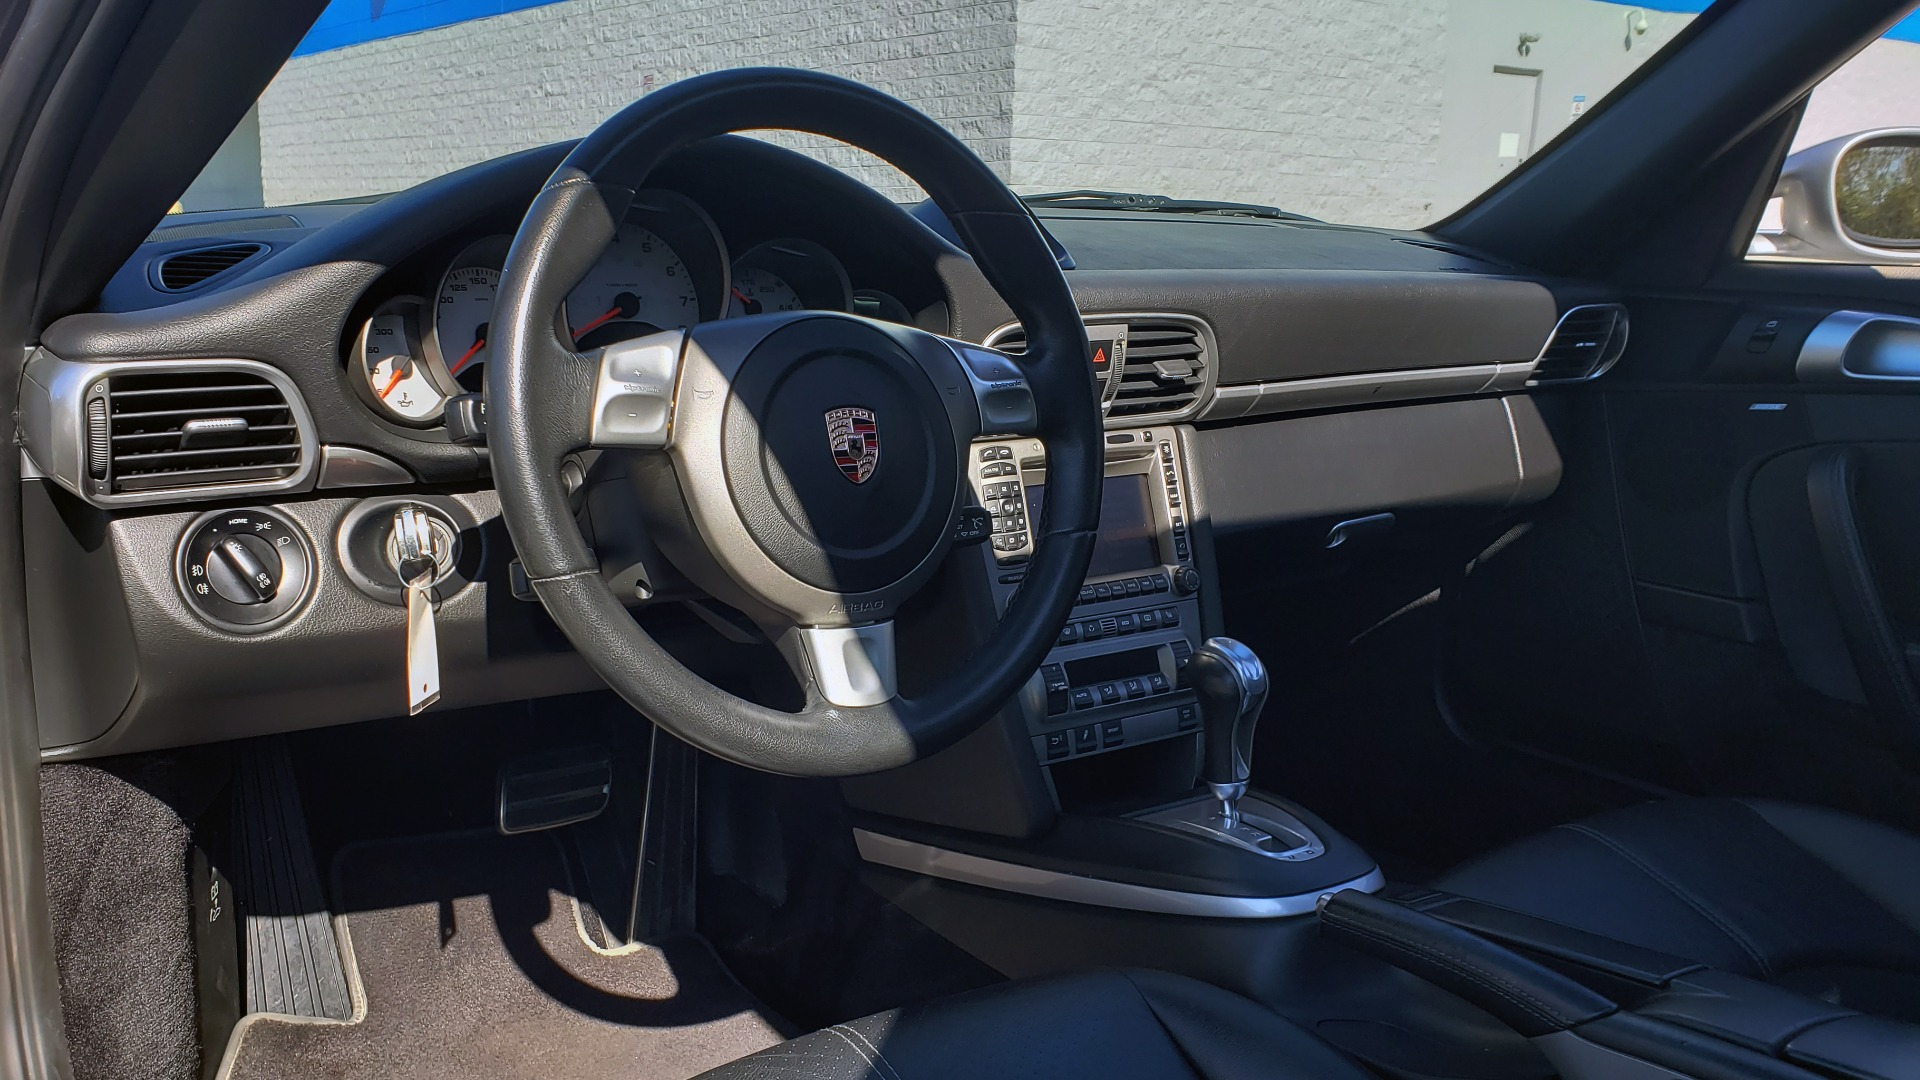 Used 2006 Porsche 911 CARRERA S / 5-SPD AUTO / SPORT CHRONO / NAV / BOSE / SUNROOF for sale Sold at Formula Imports in Charlotte NC 28227 32